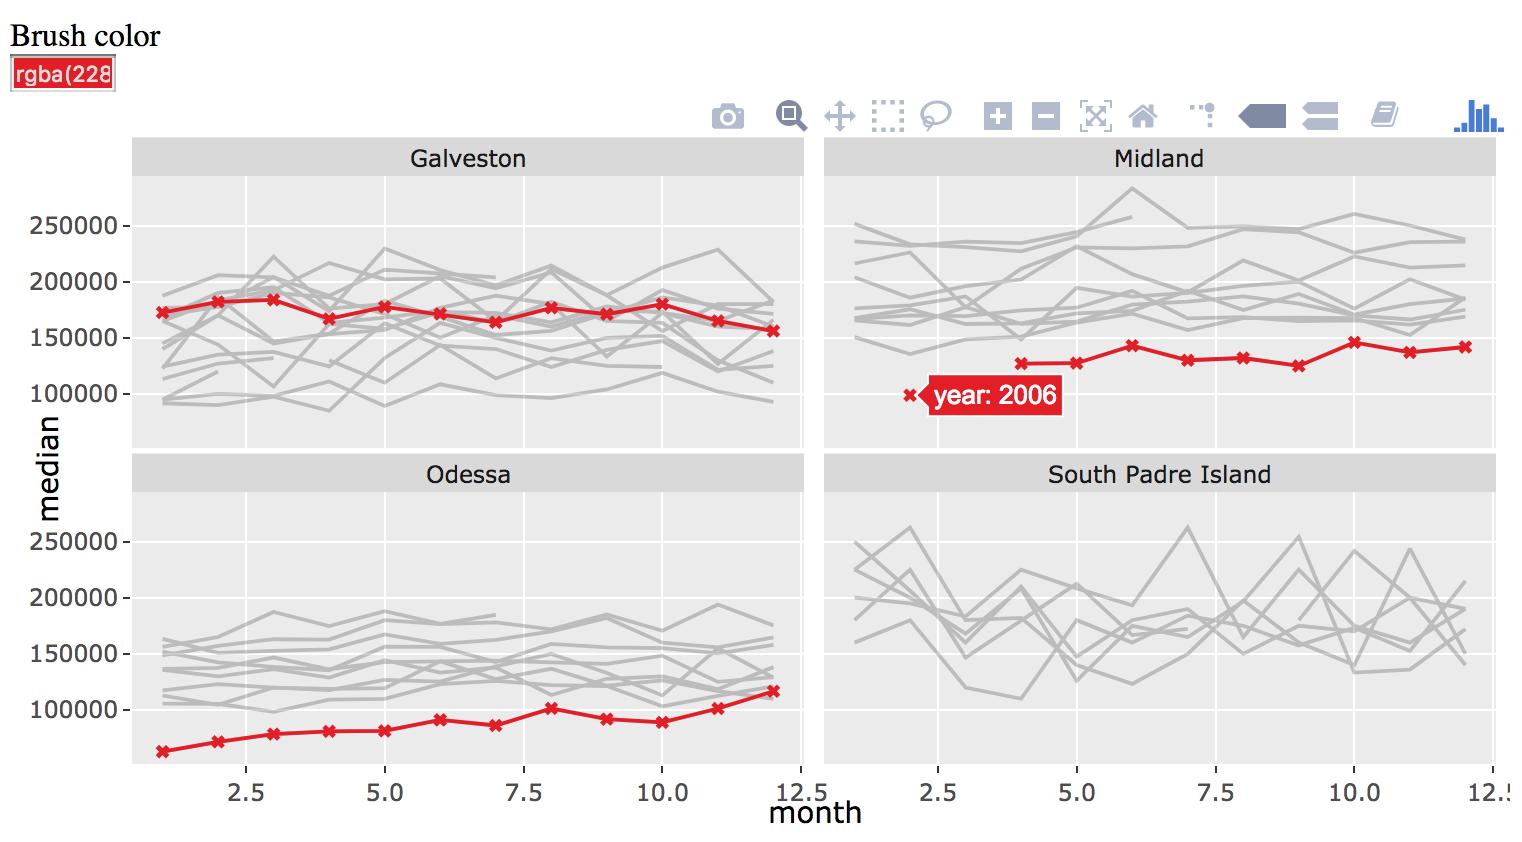 Interactive dataviz on the web with R & plotly